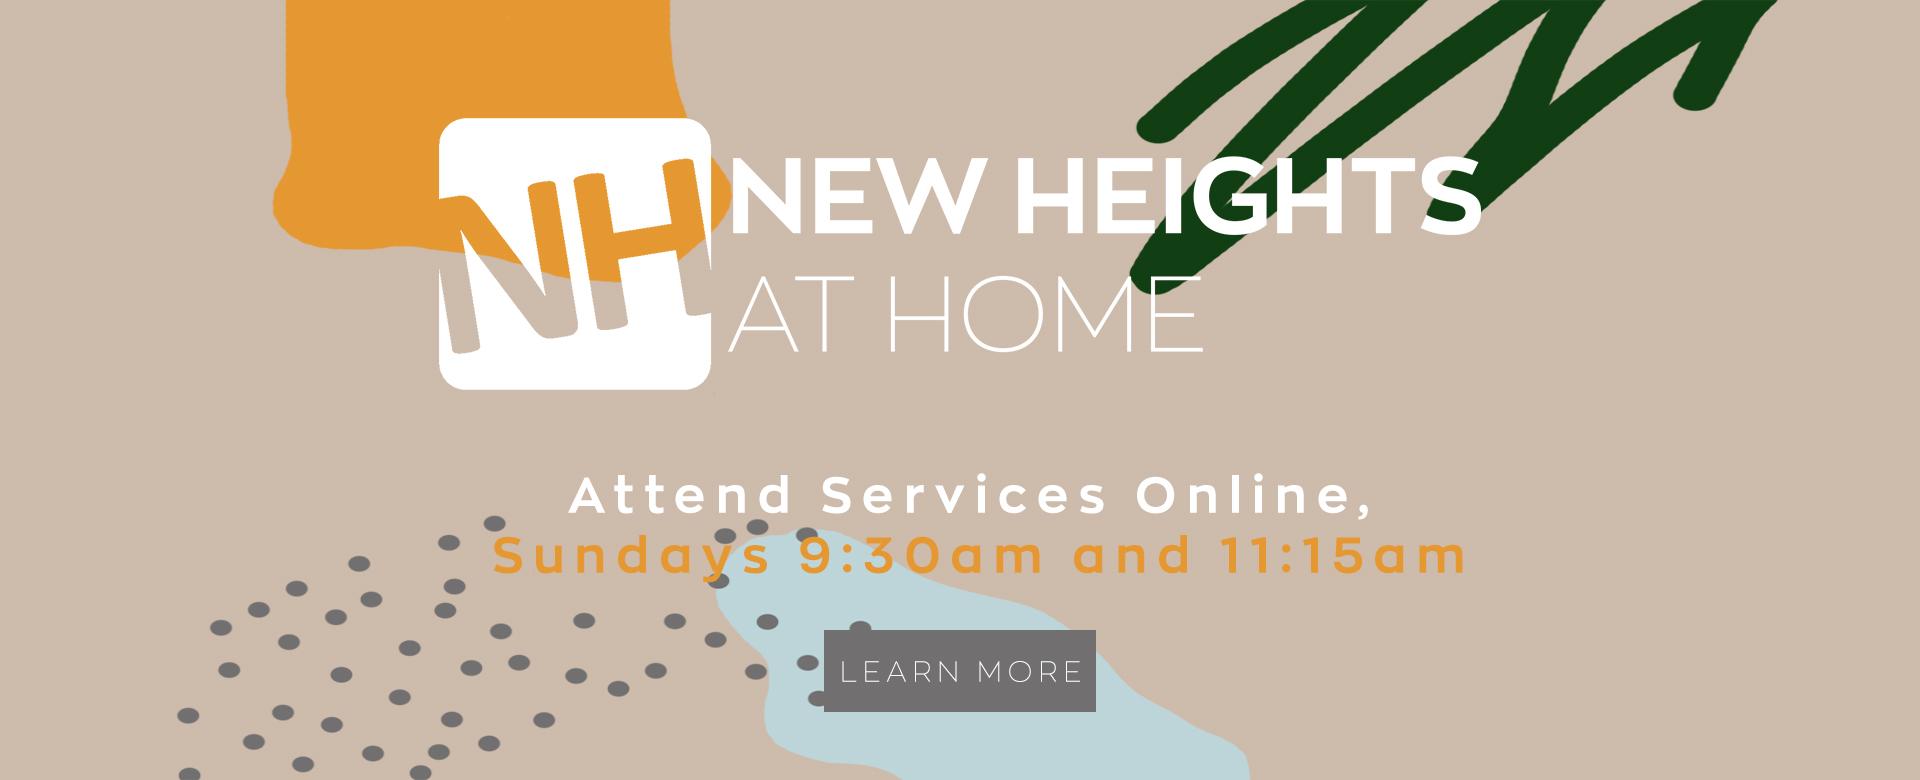 Online Church Webpage